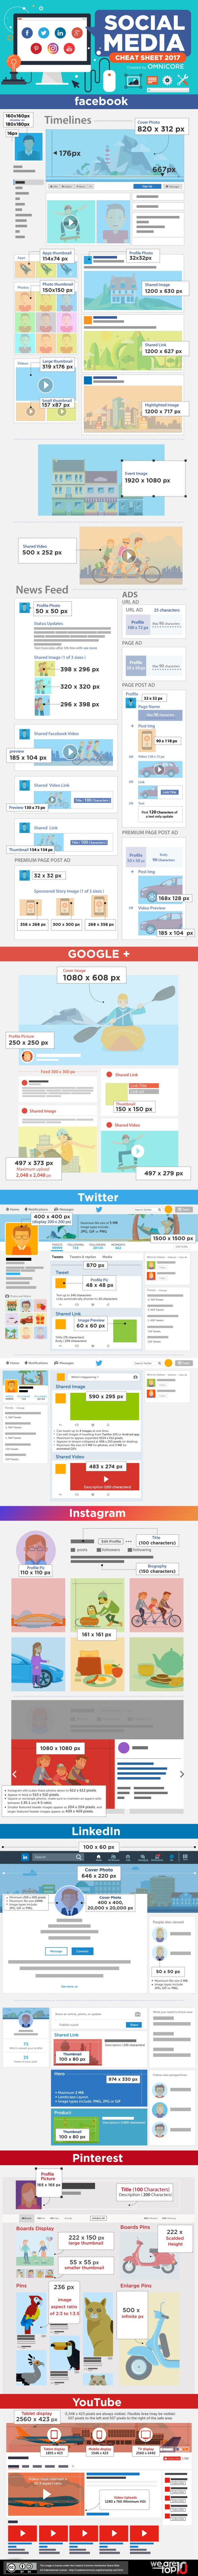 social image cheat sheet info